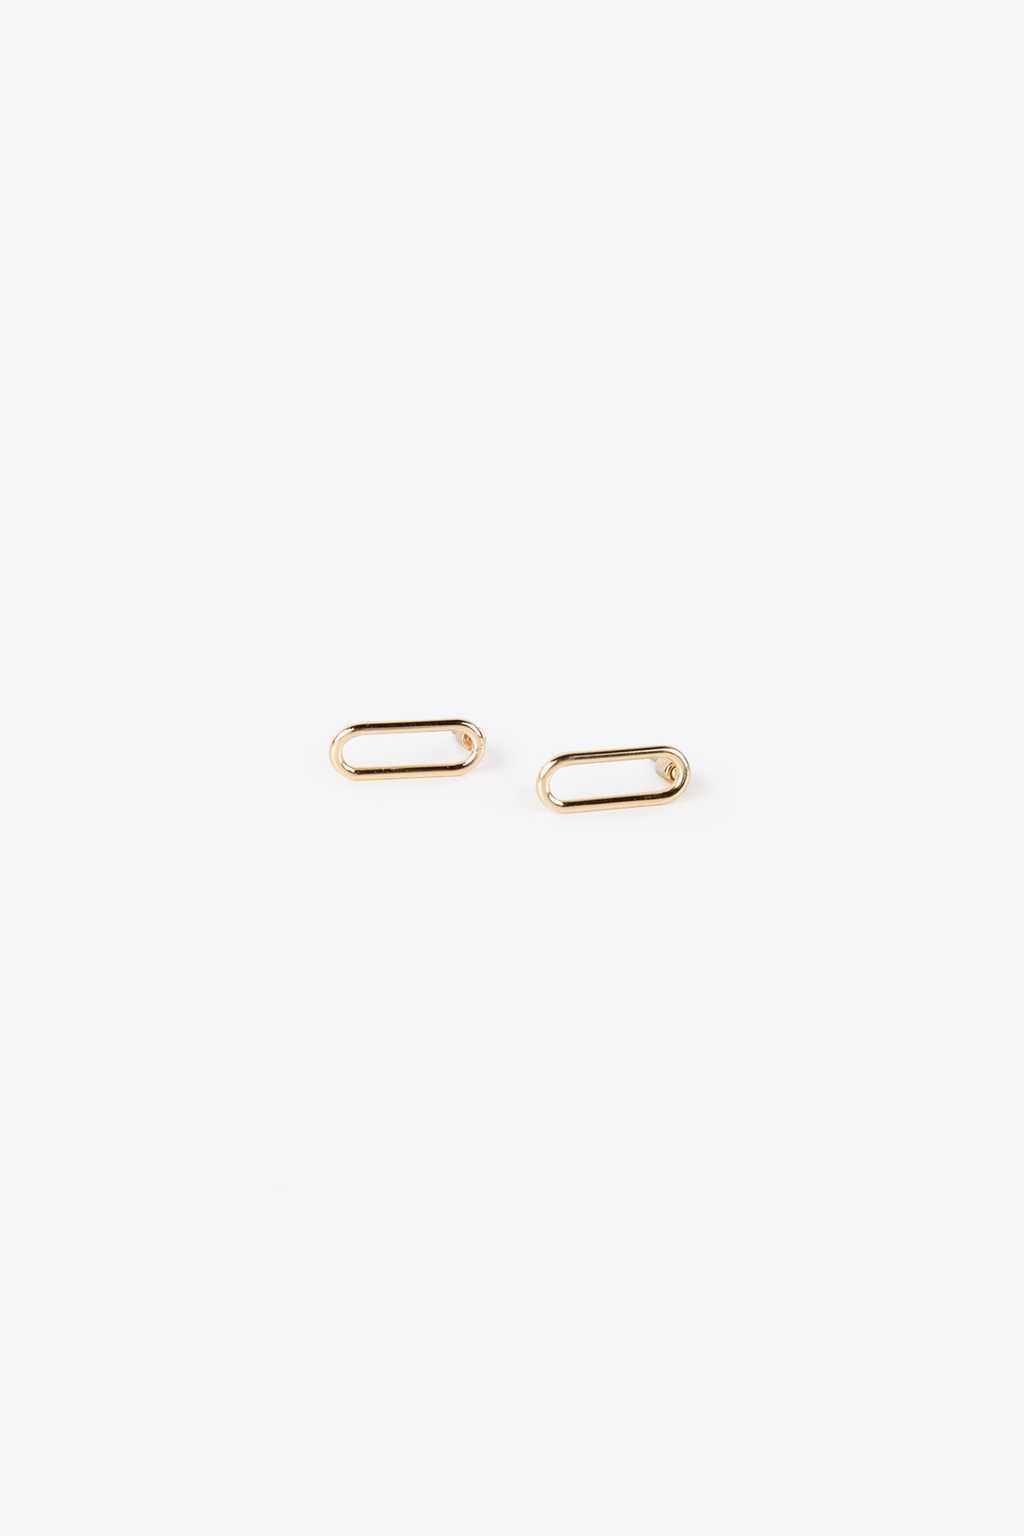 Earring 1582 Gold 1